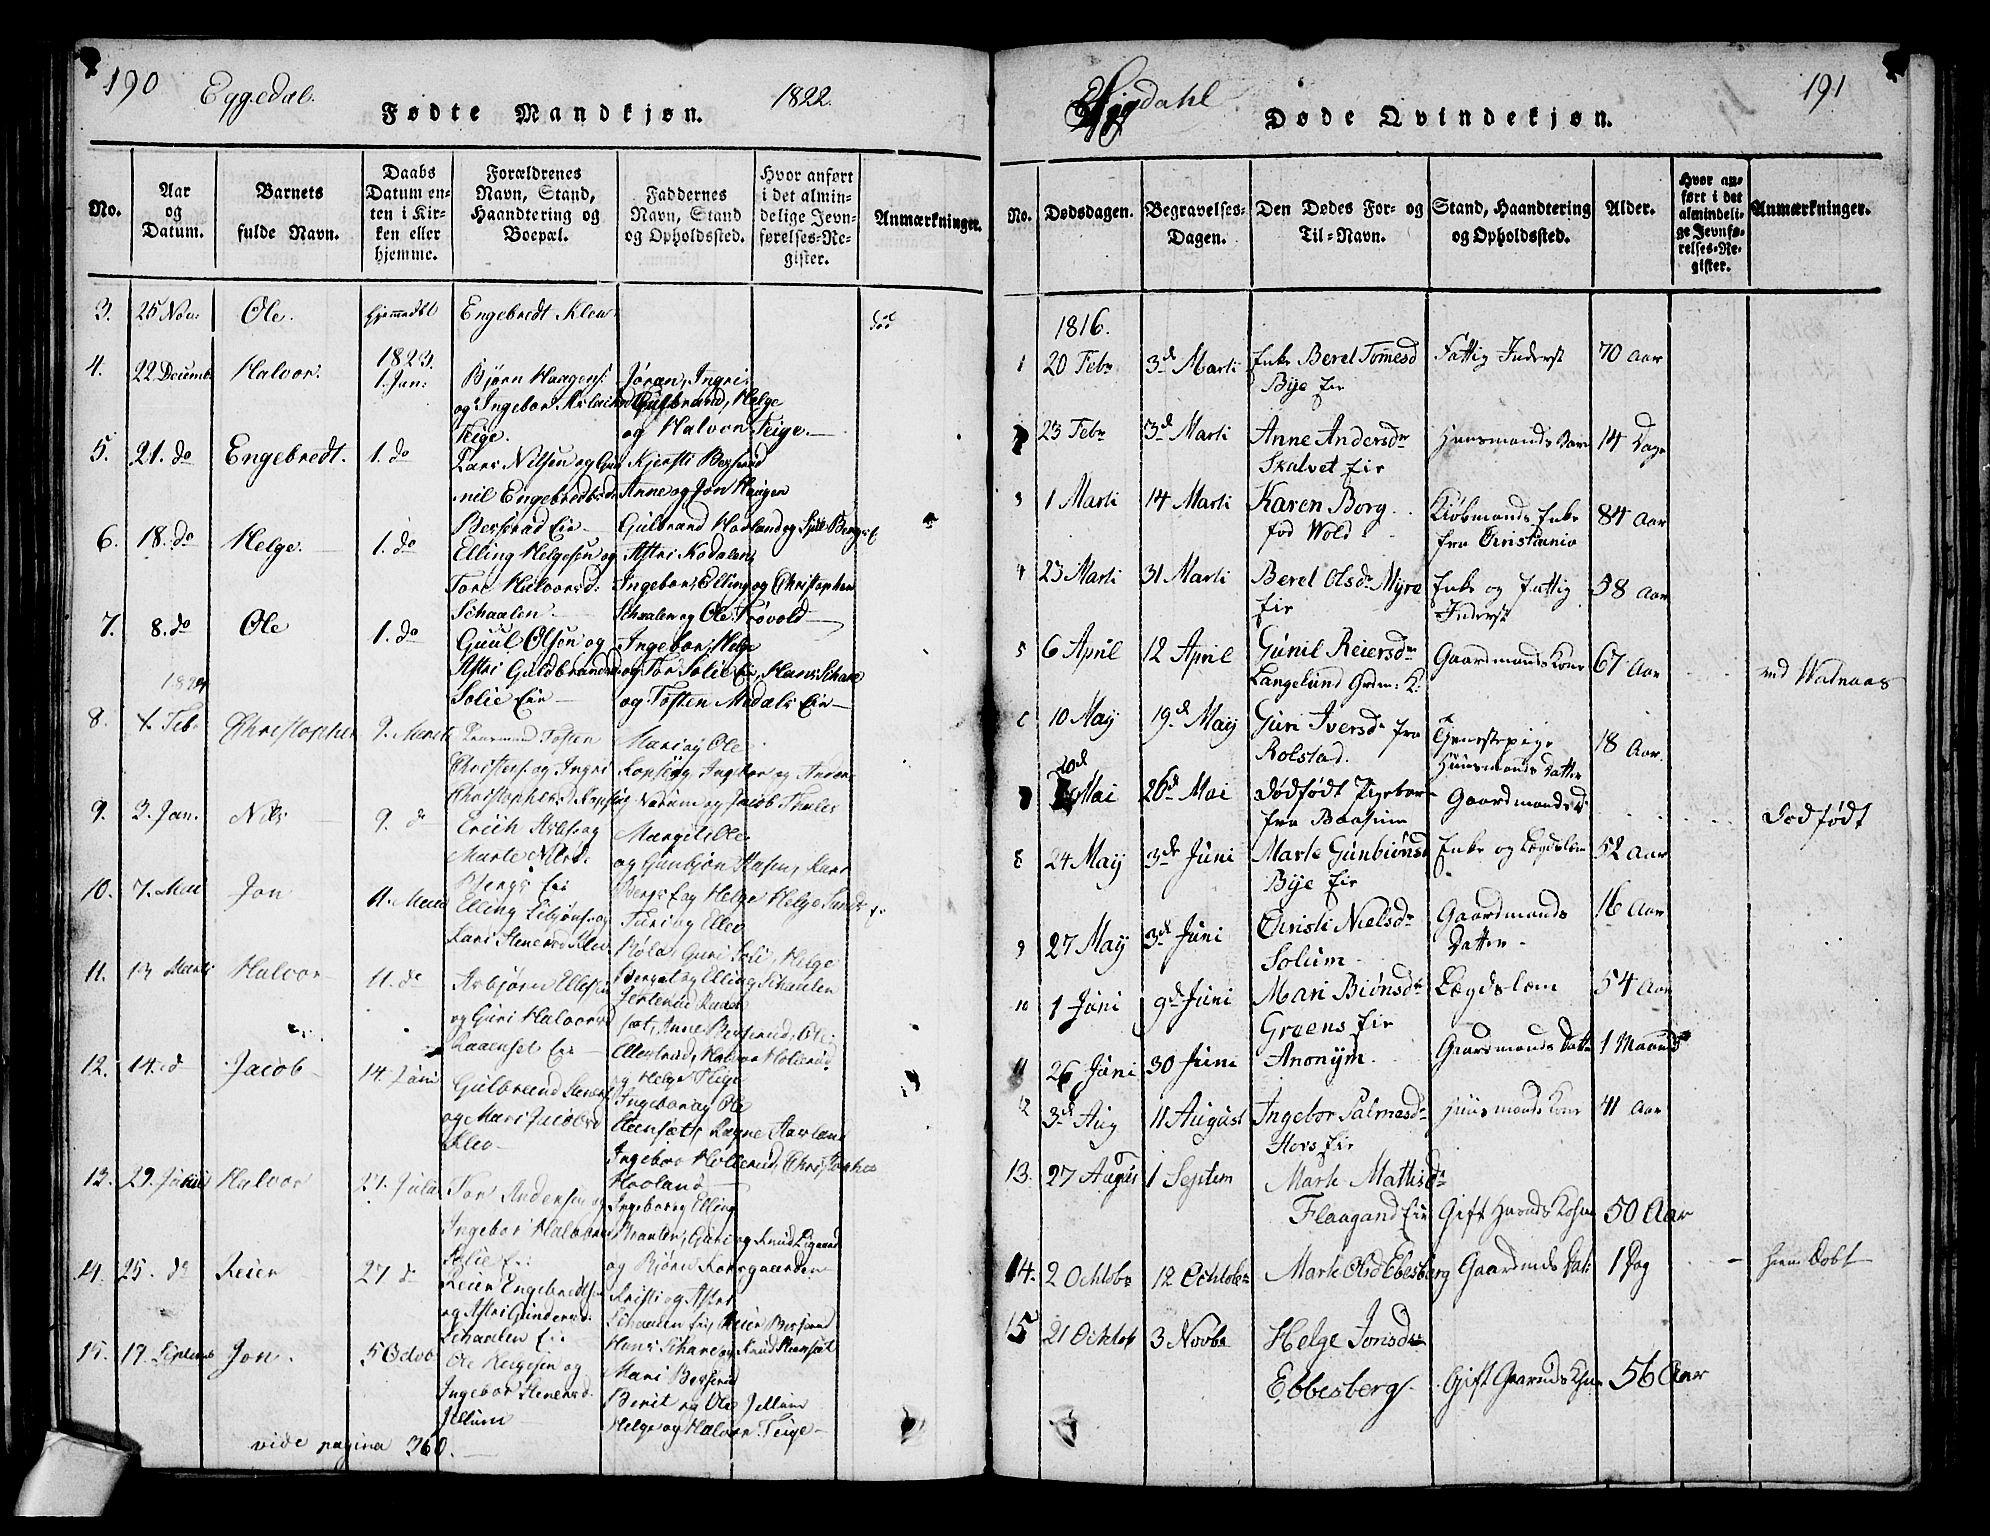 SAKO, Sigdal kirkebøker, G/Ga/L0001: Klokkerbok nr. I 1 /1, 1816-1835, s. 190-191